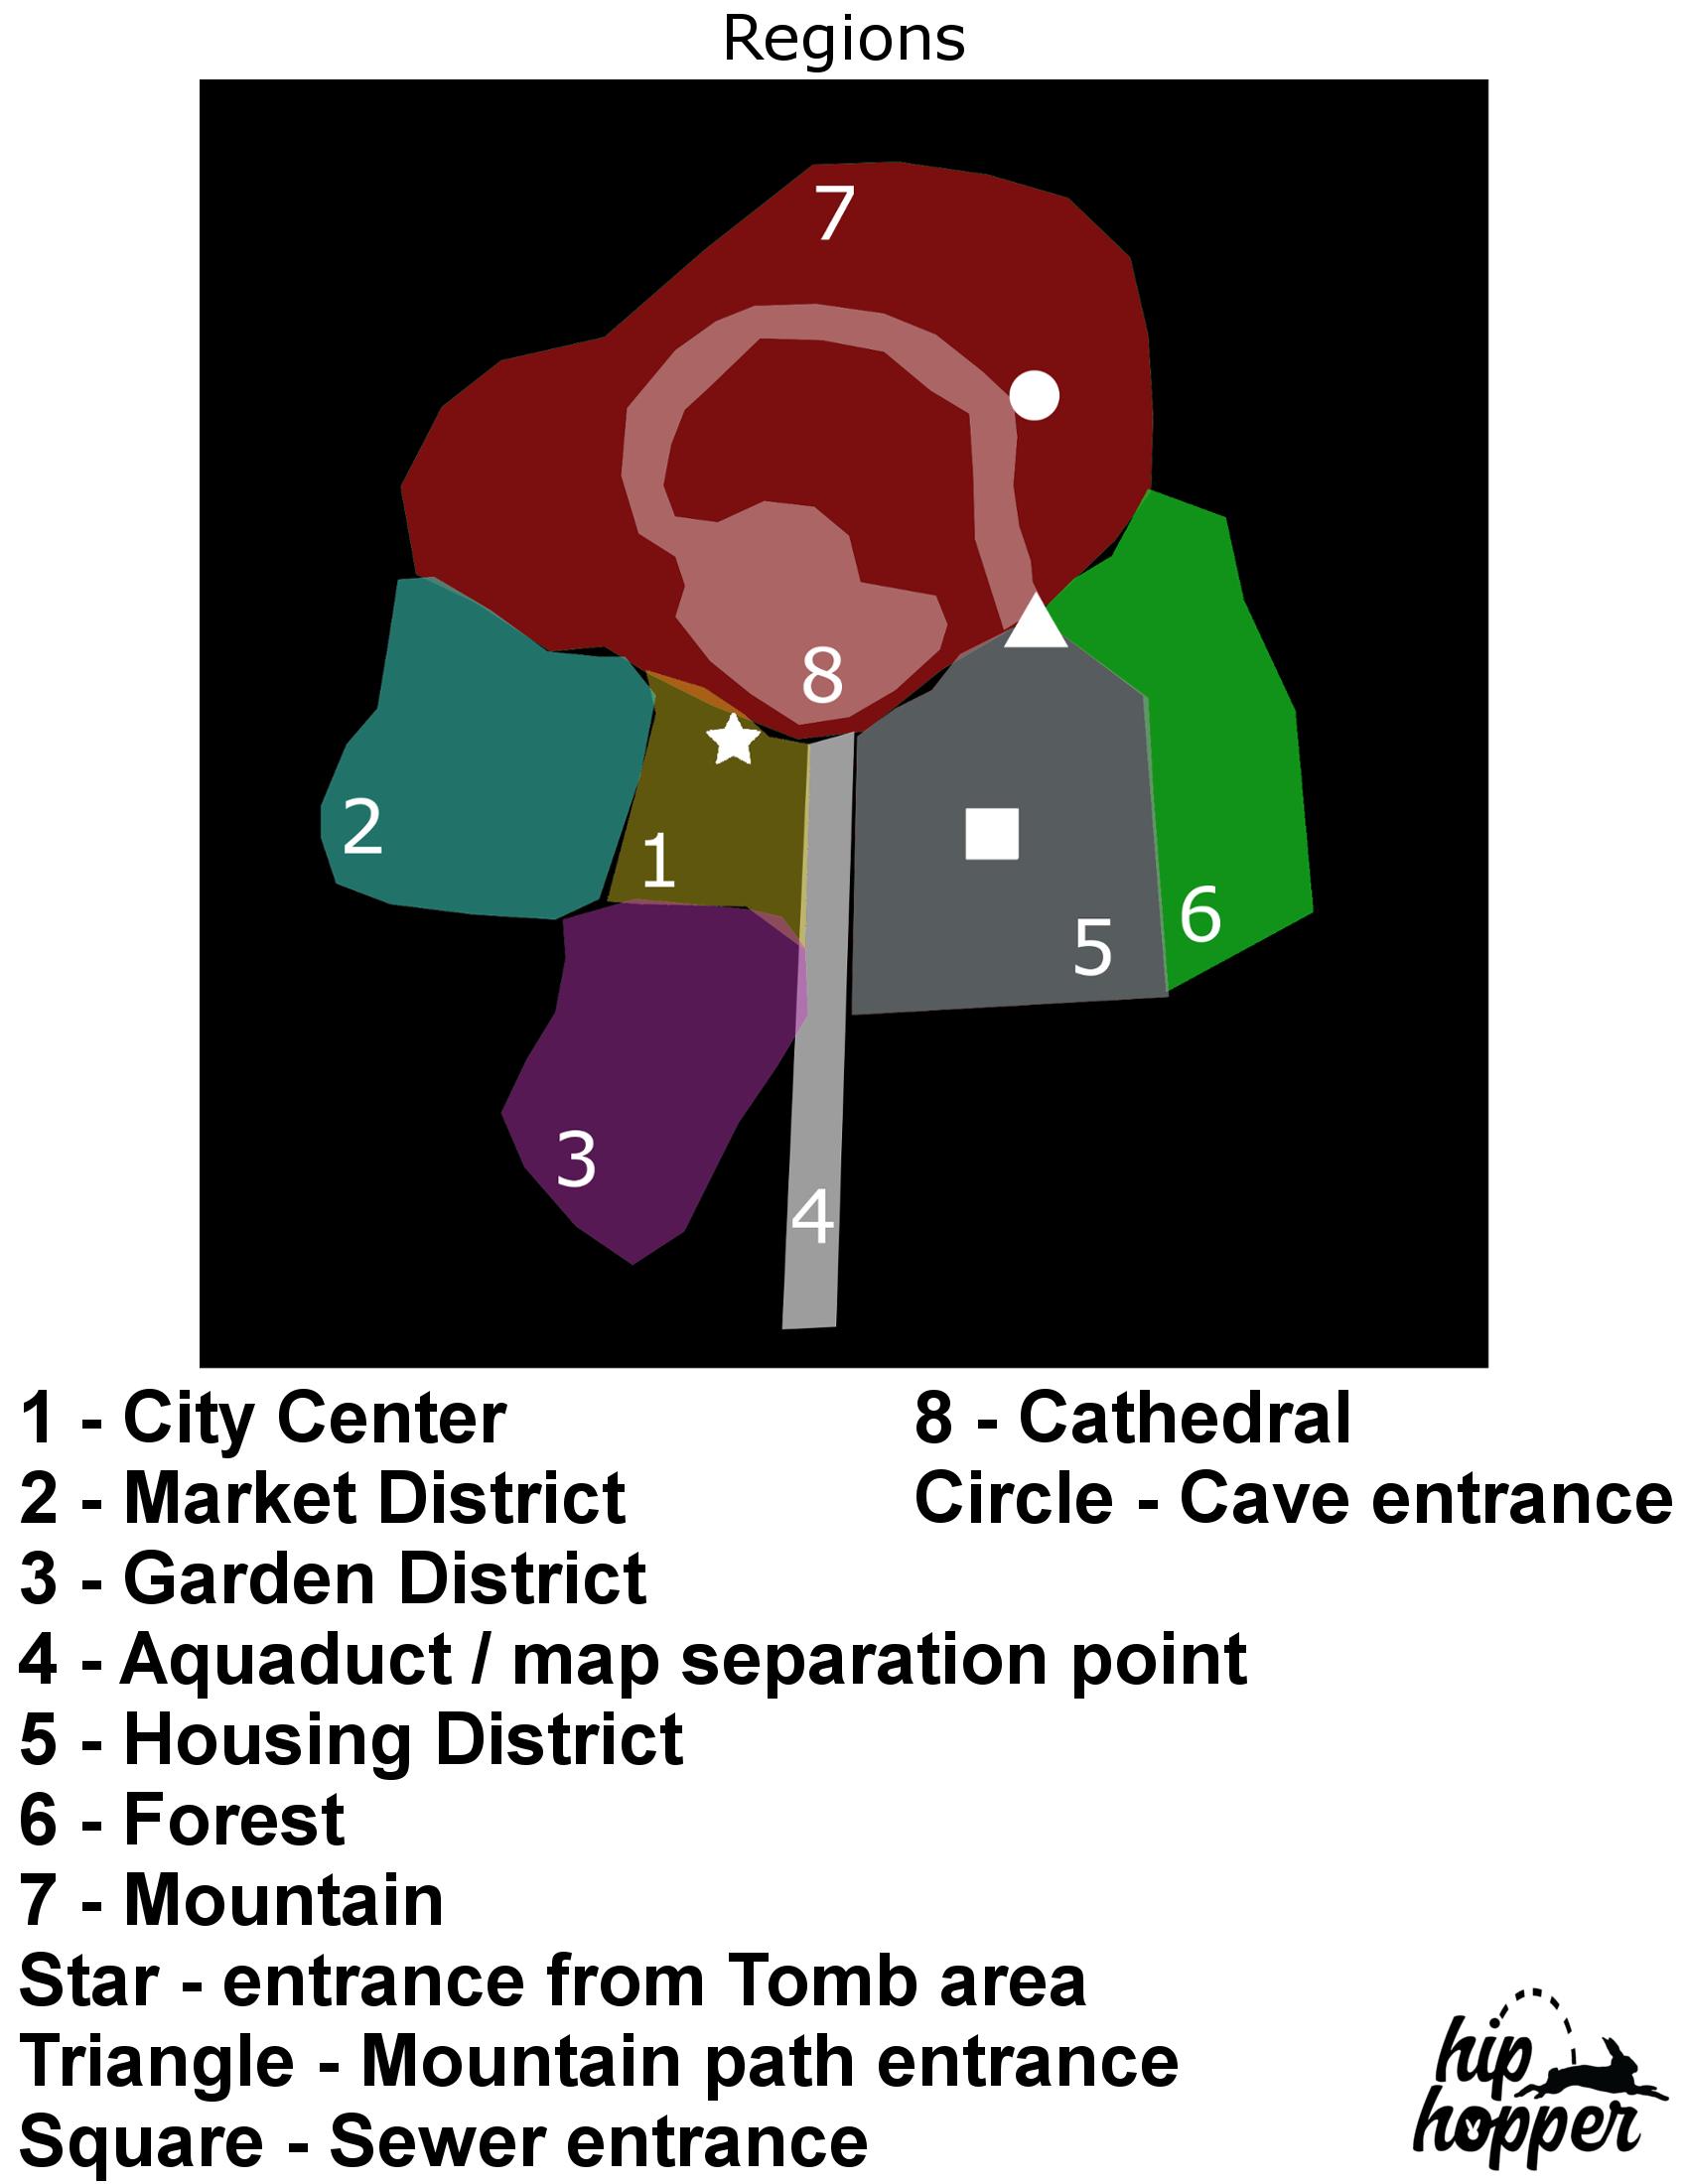 Map Redesign - Regions